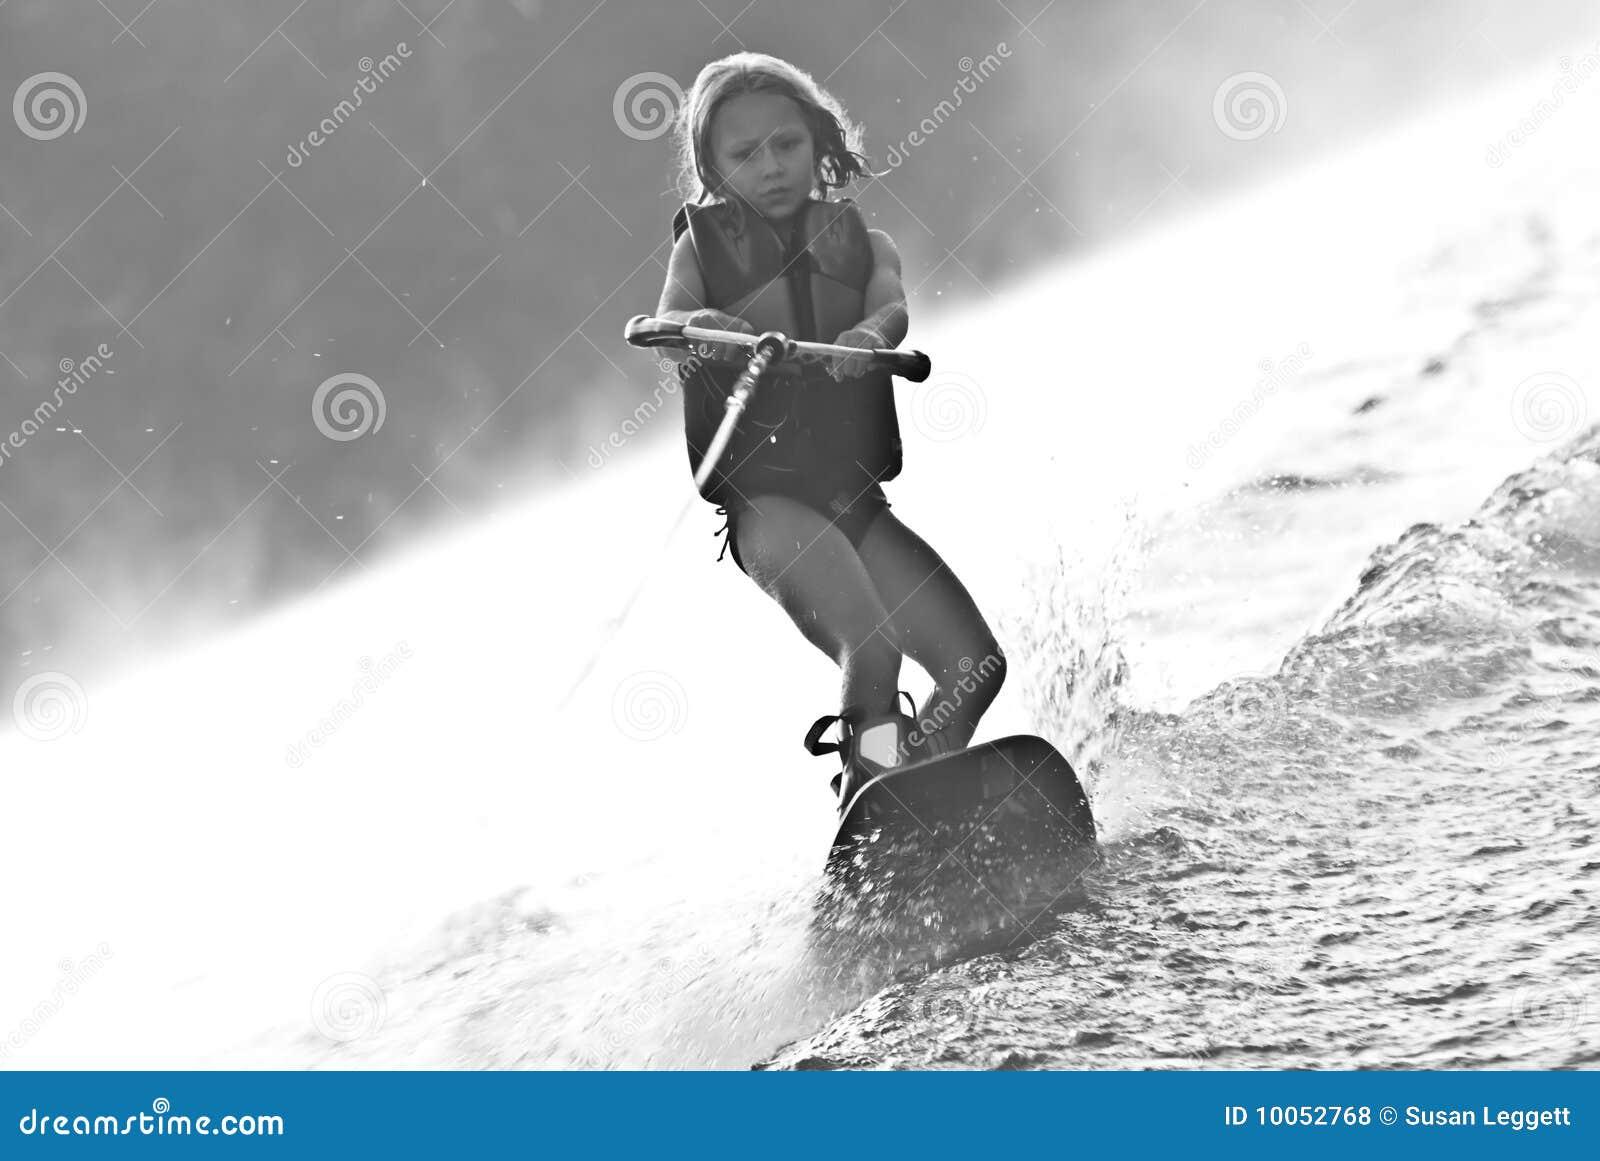 Rapariga em Wakeboard